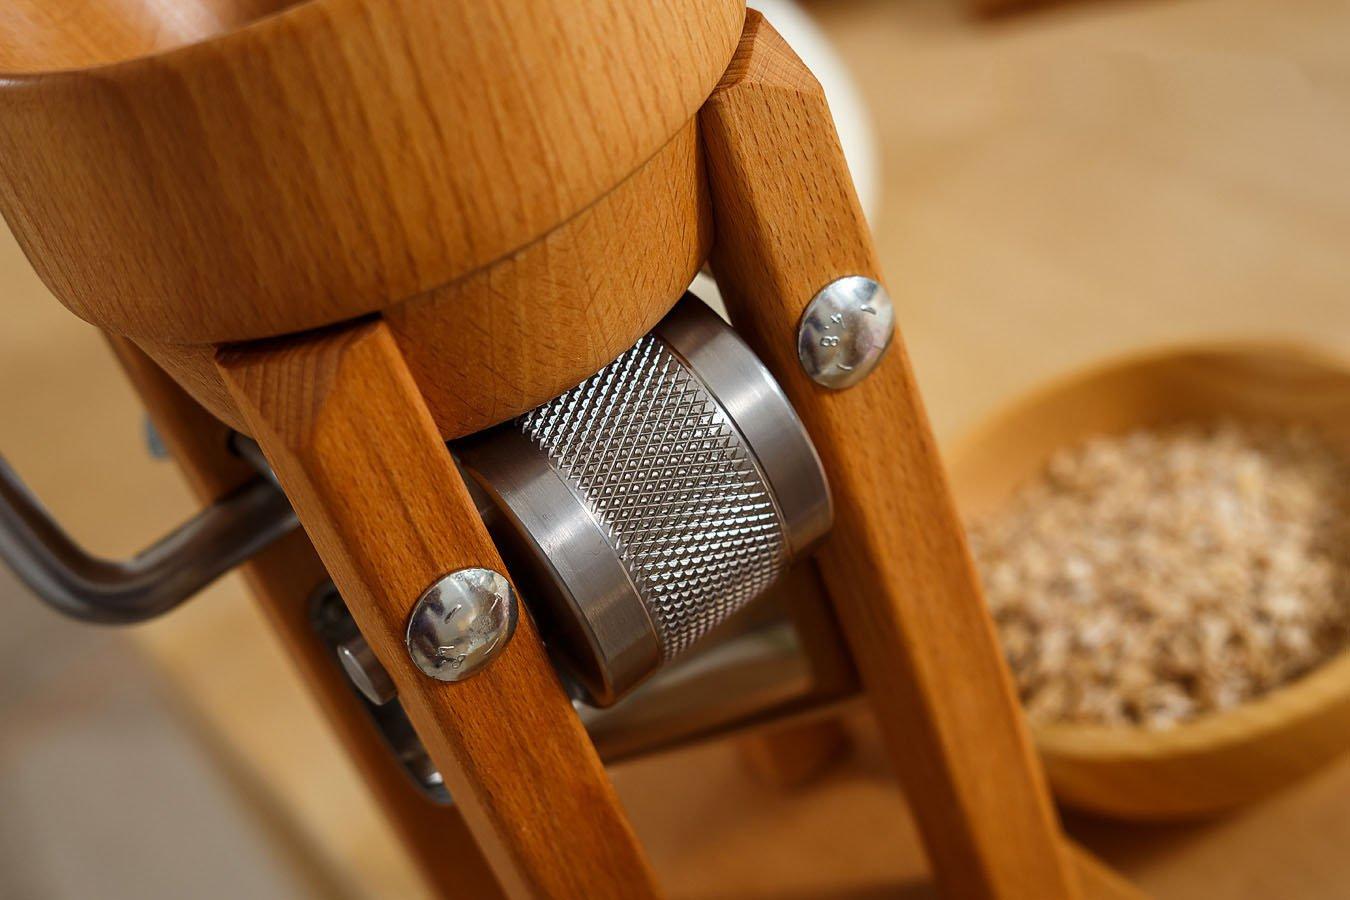 Eschenfelder Grain Flaker with Wood Funnel